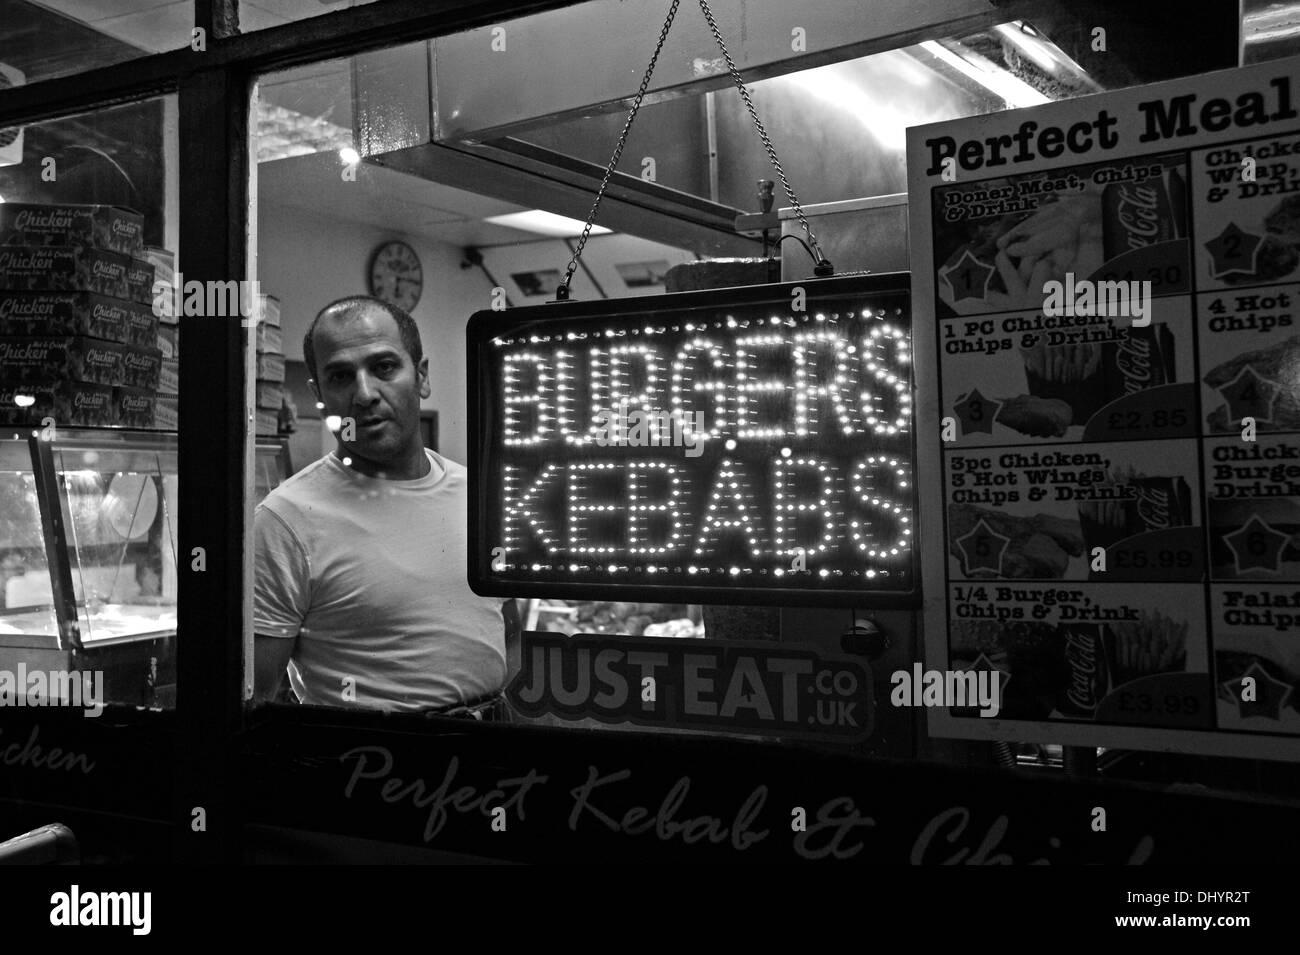 Kebab shop fast food takeaway in London Road Brighton UK - Stock Image